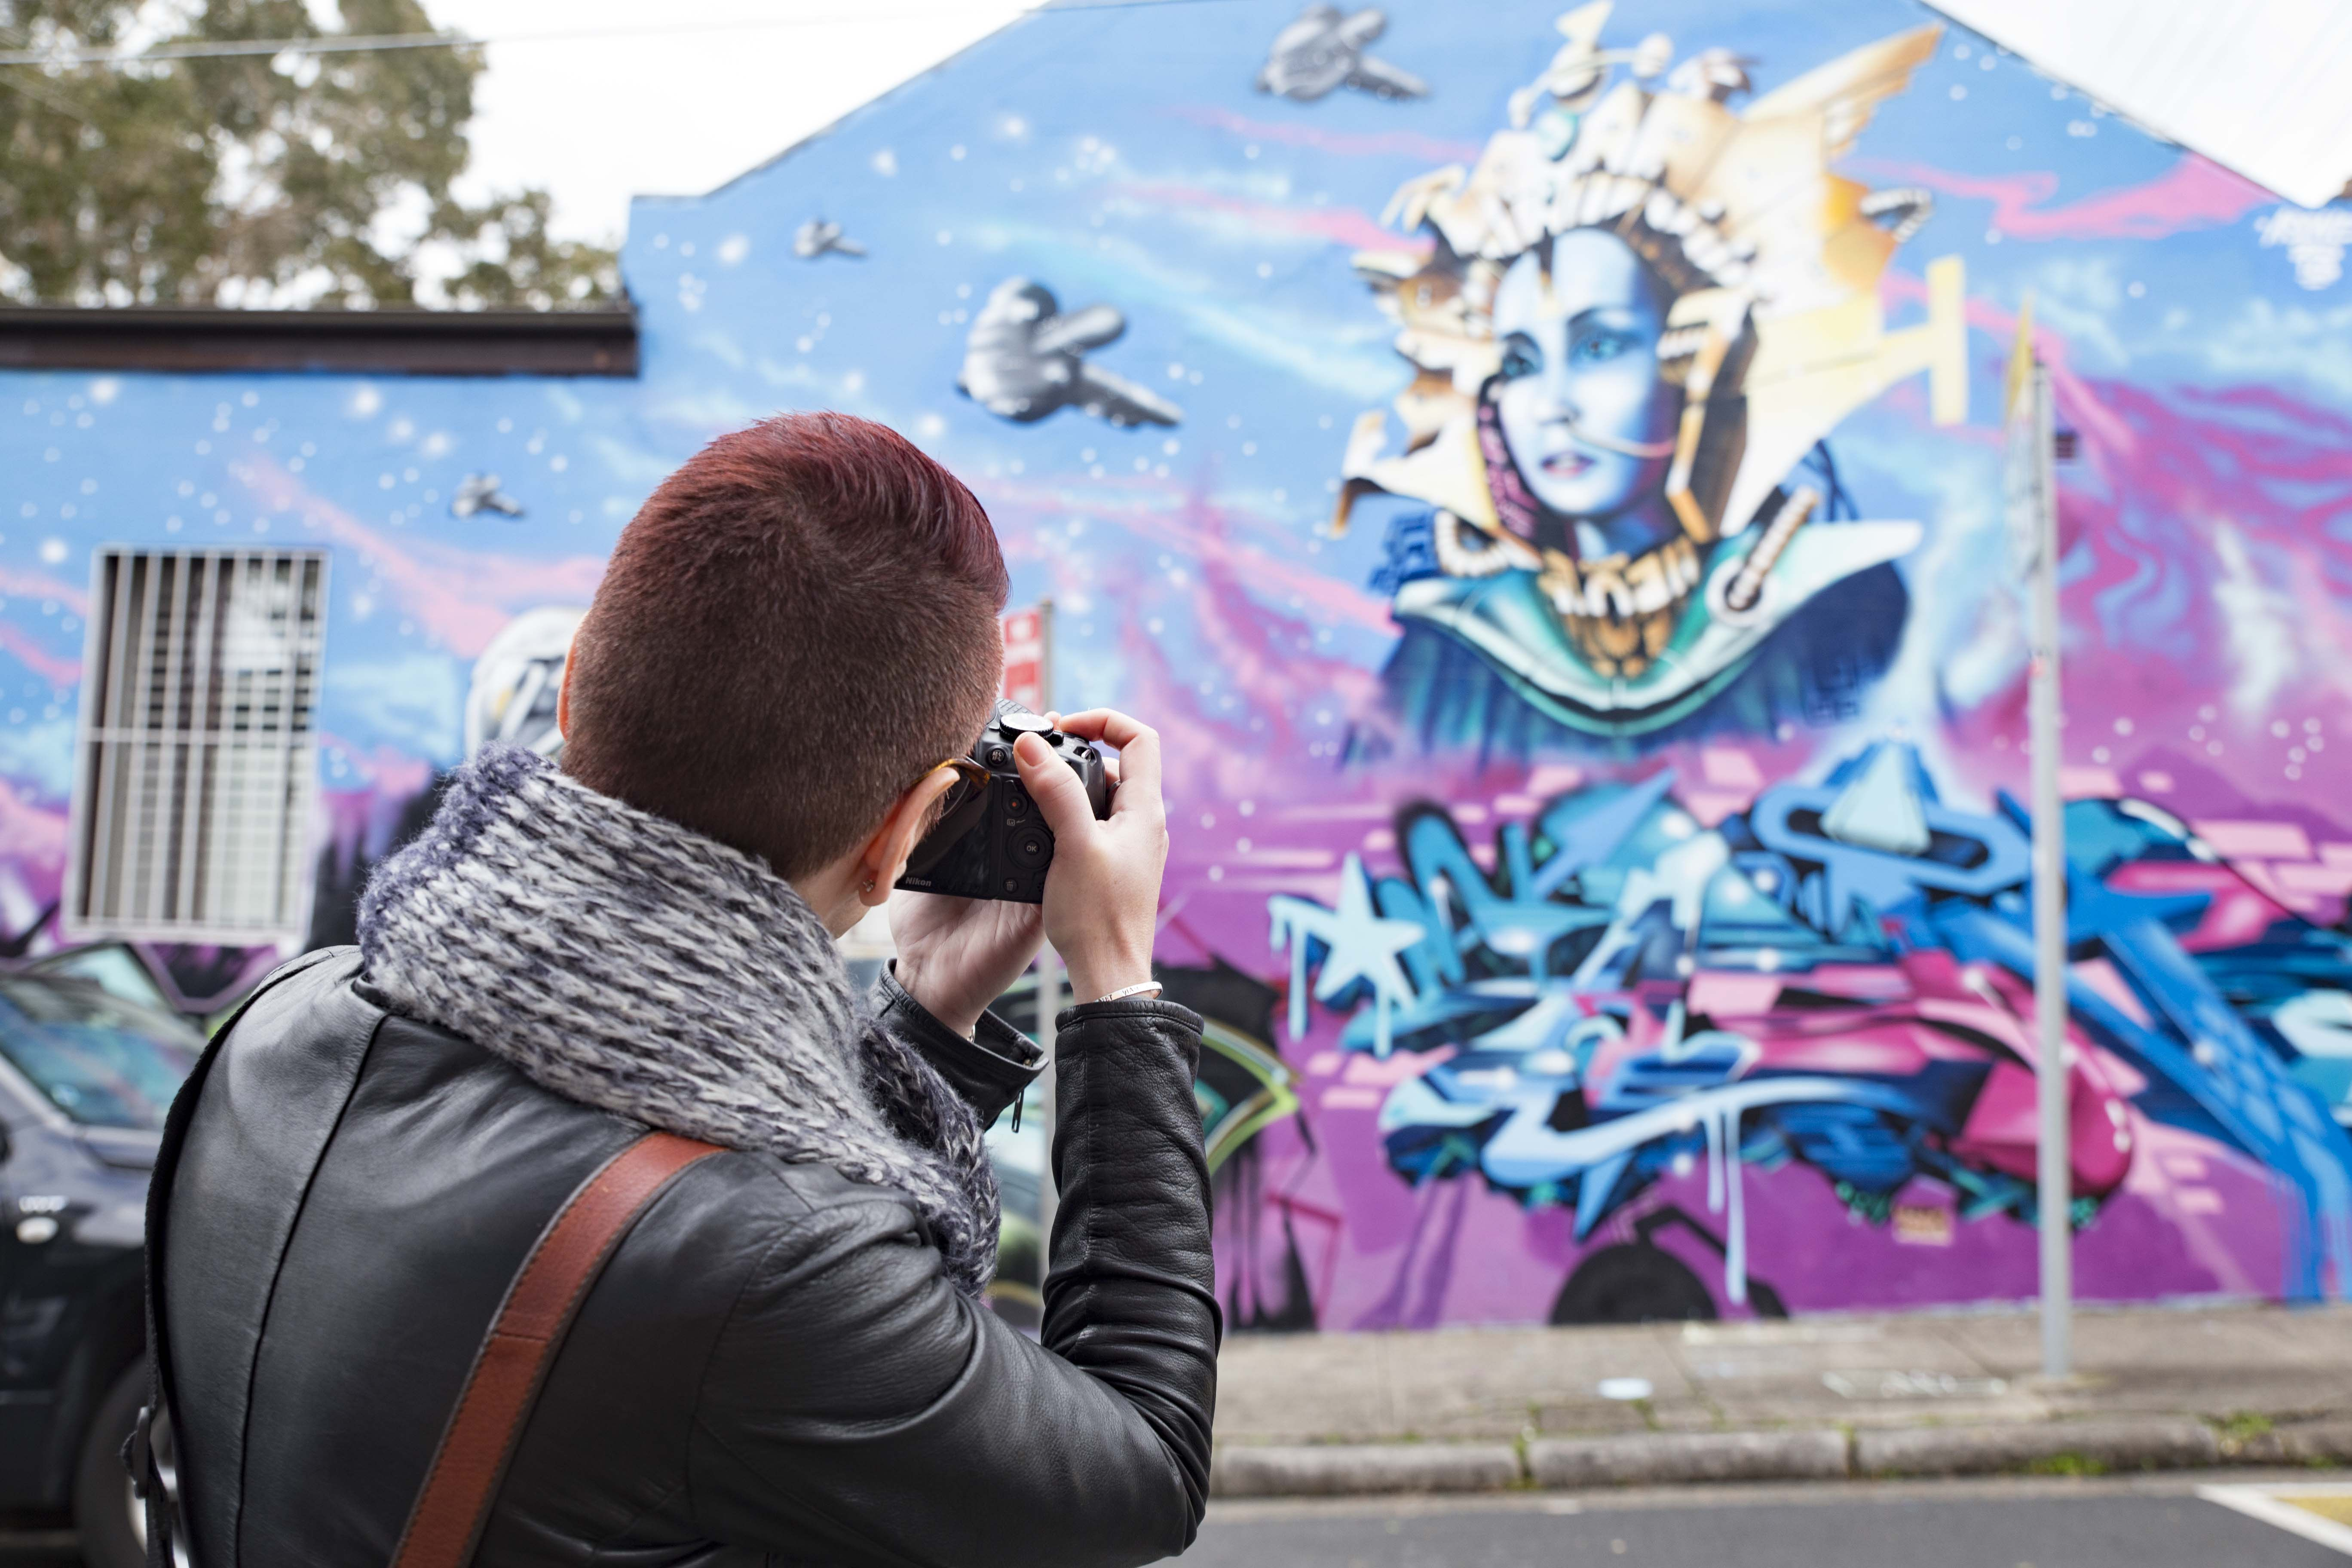 Sydney Street Photography Adventure, Newtown (The Poetic Witness)